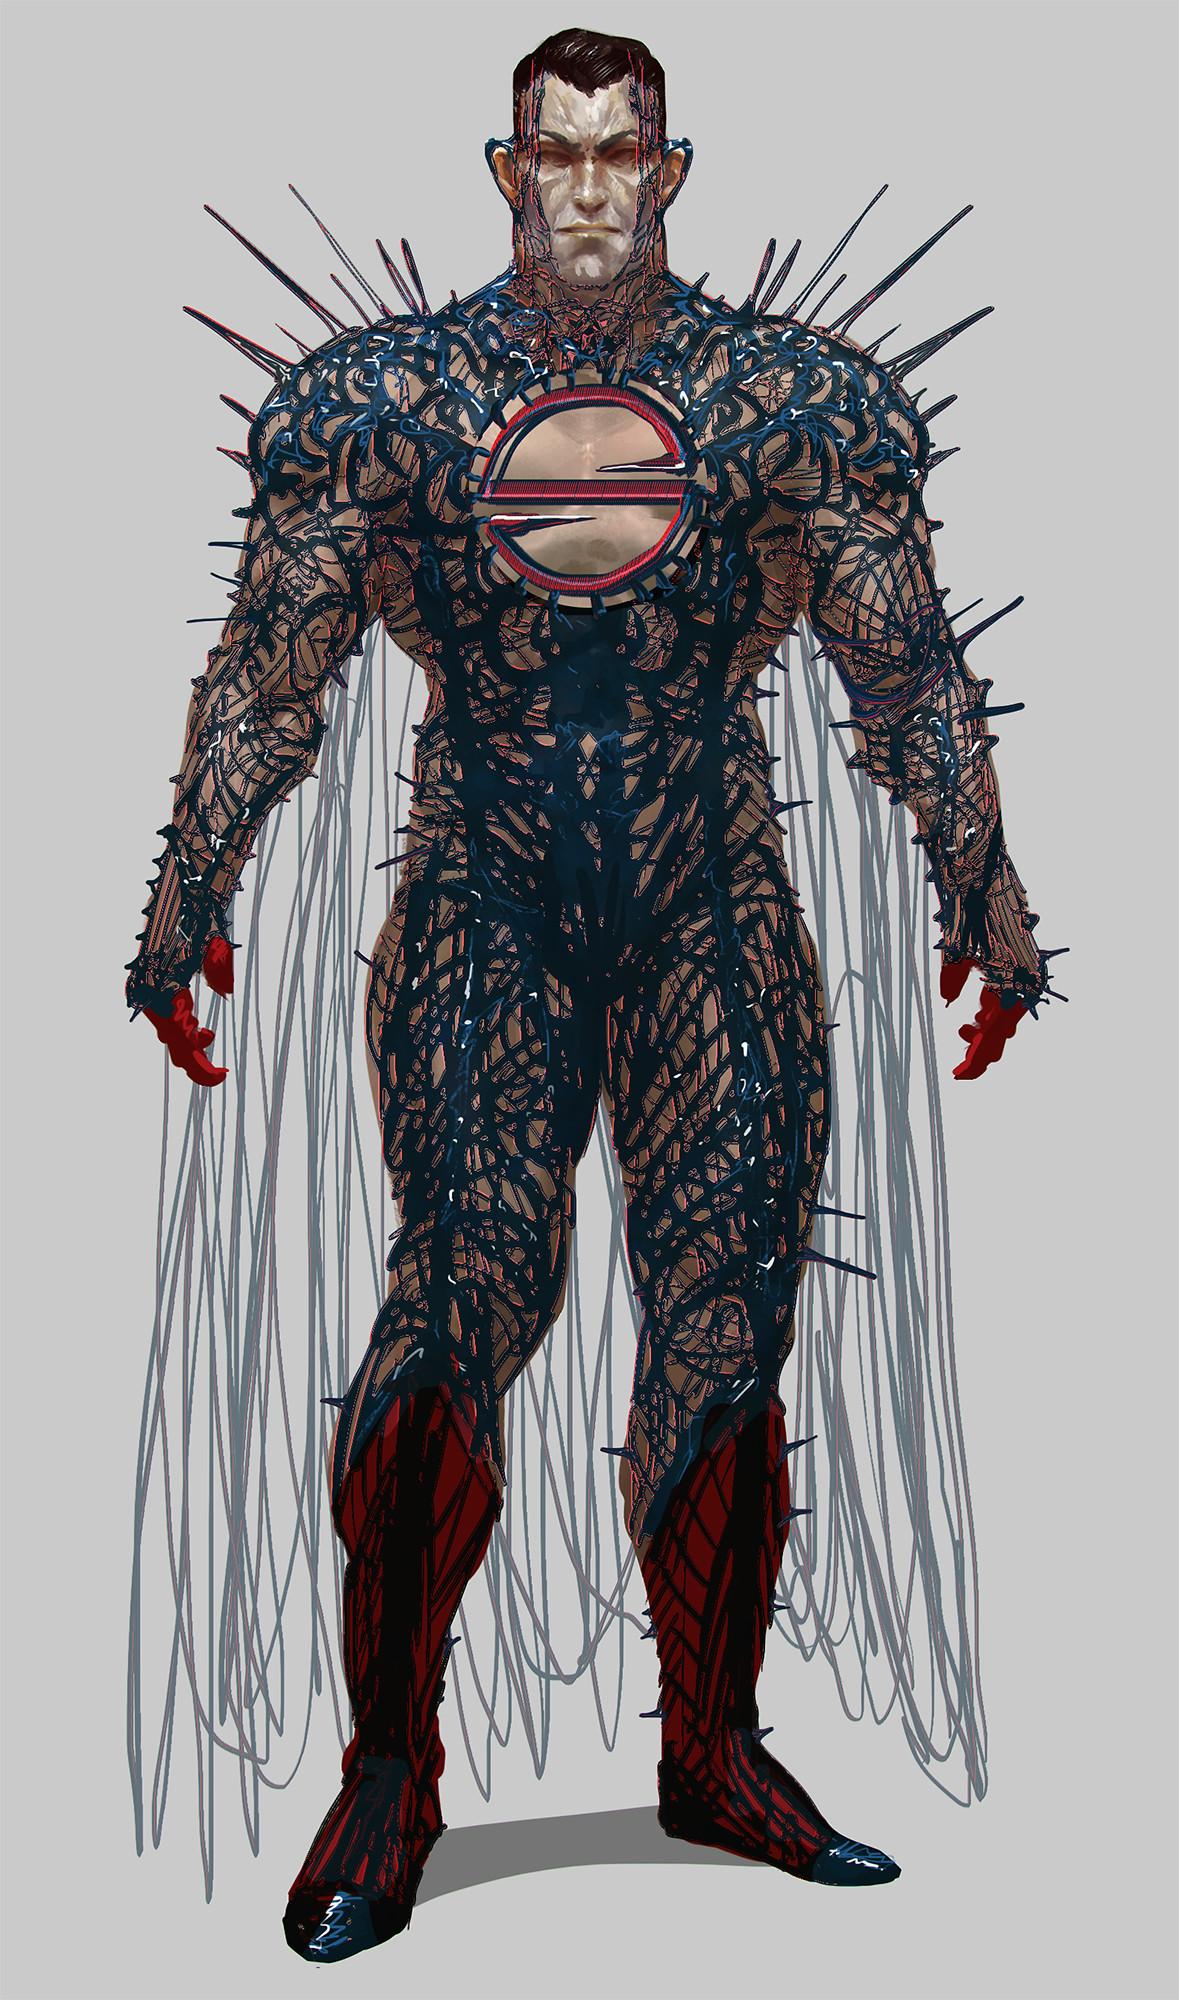 Chenthooran nambiarooran superman8 ananke